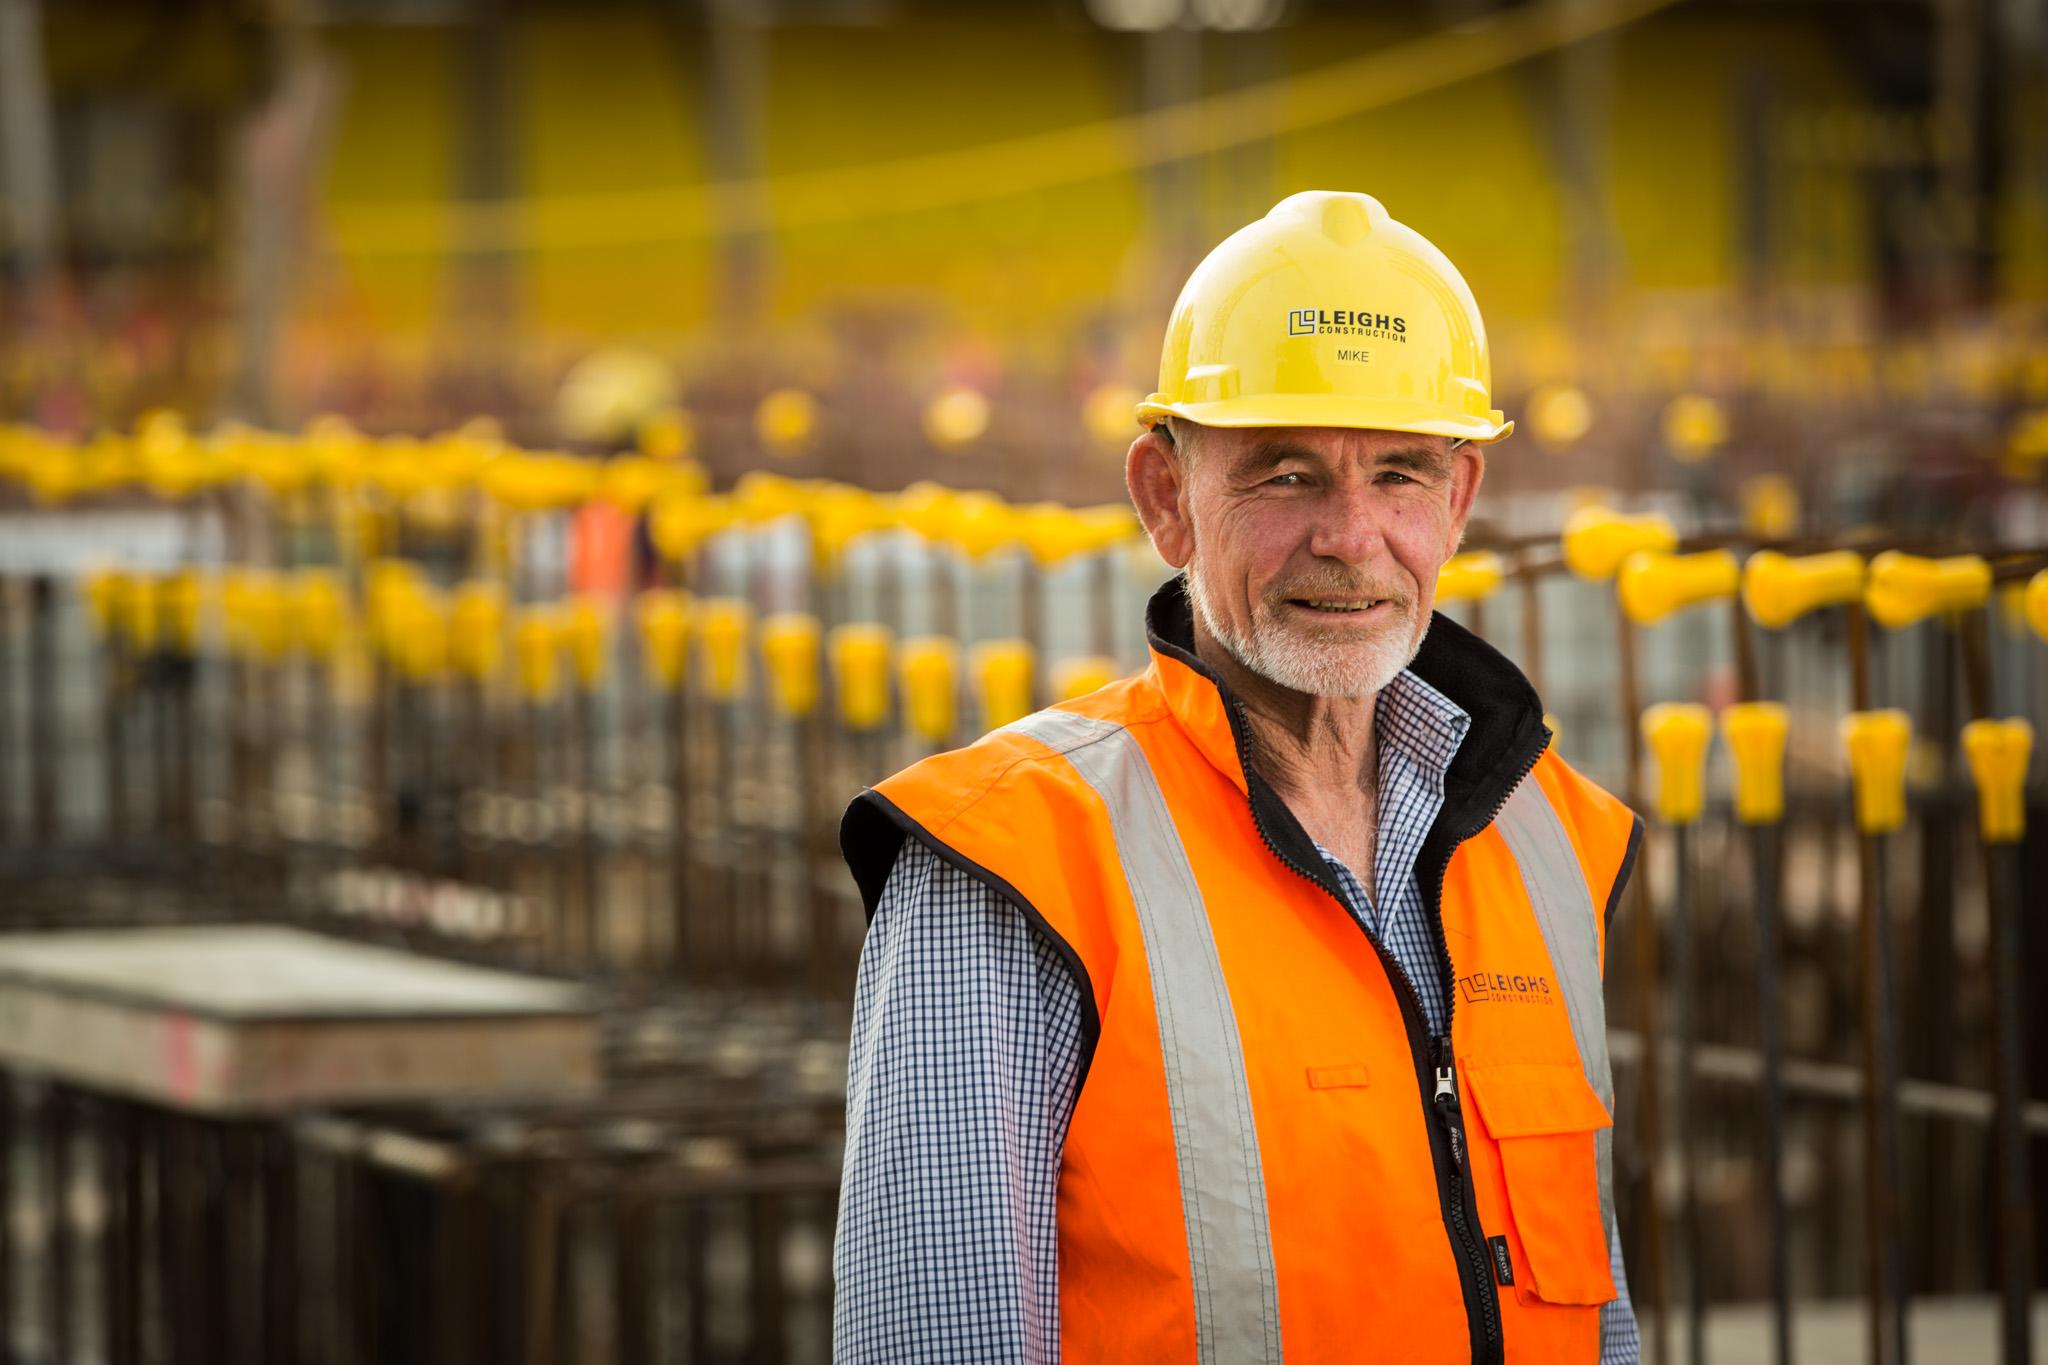 Portrait of construction worker on site